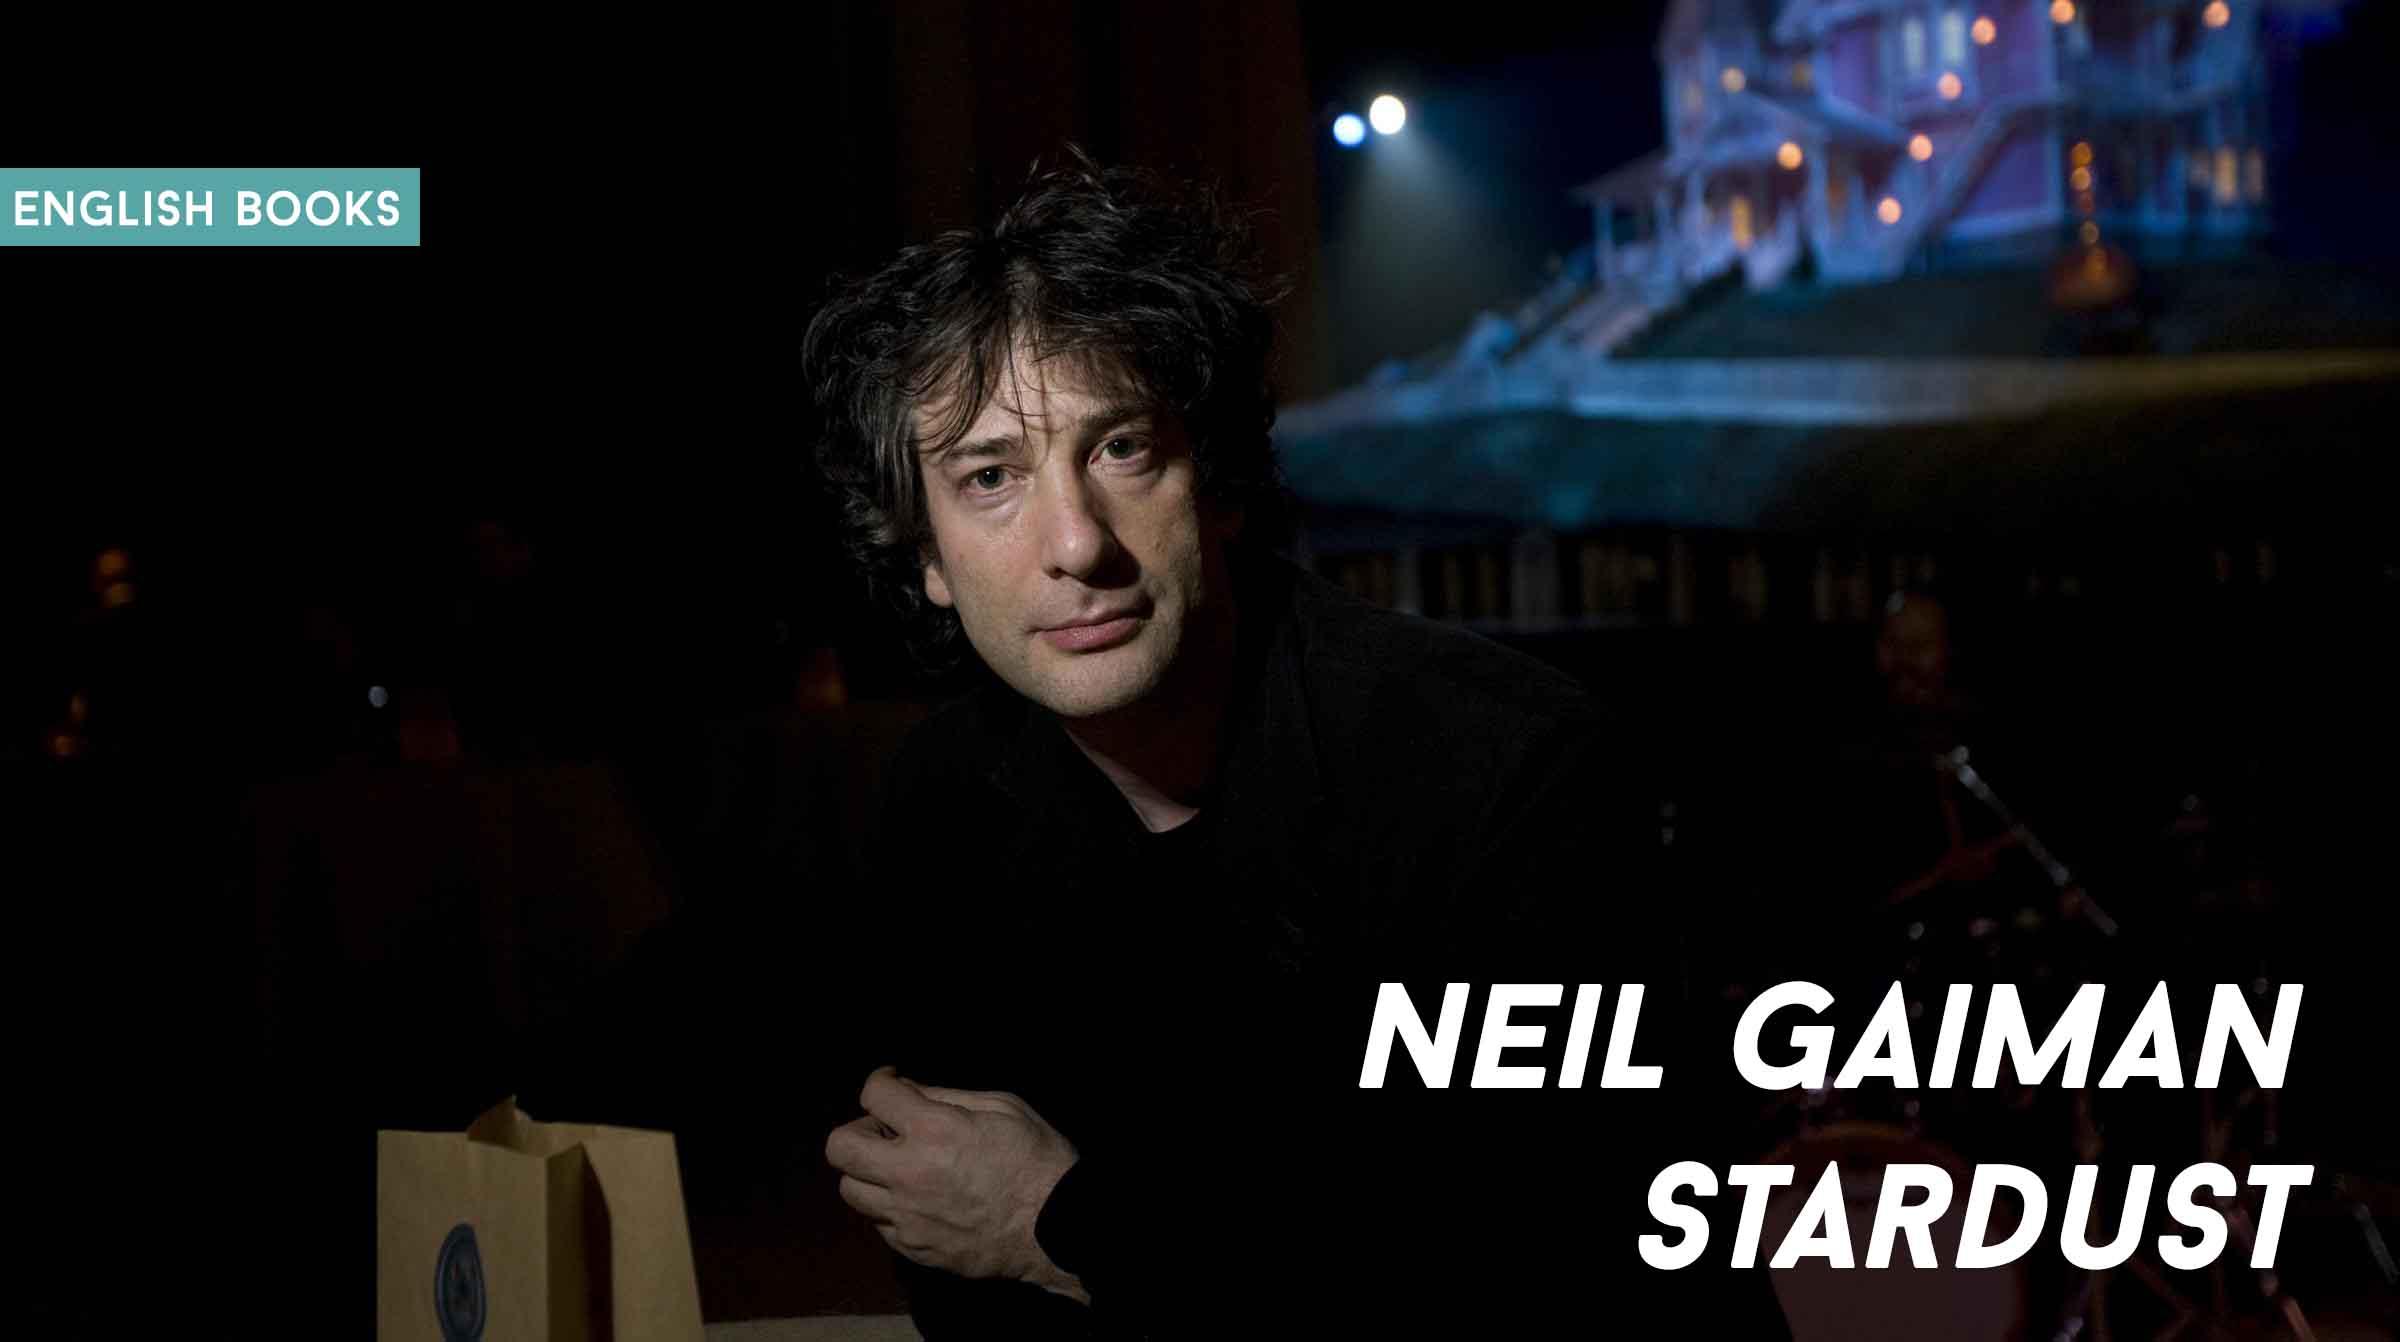 Neil Gaiman — Stardust